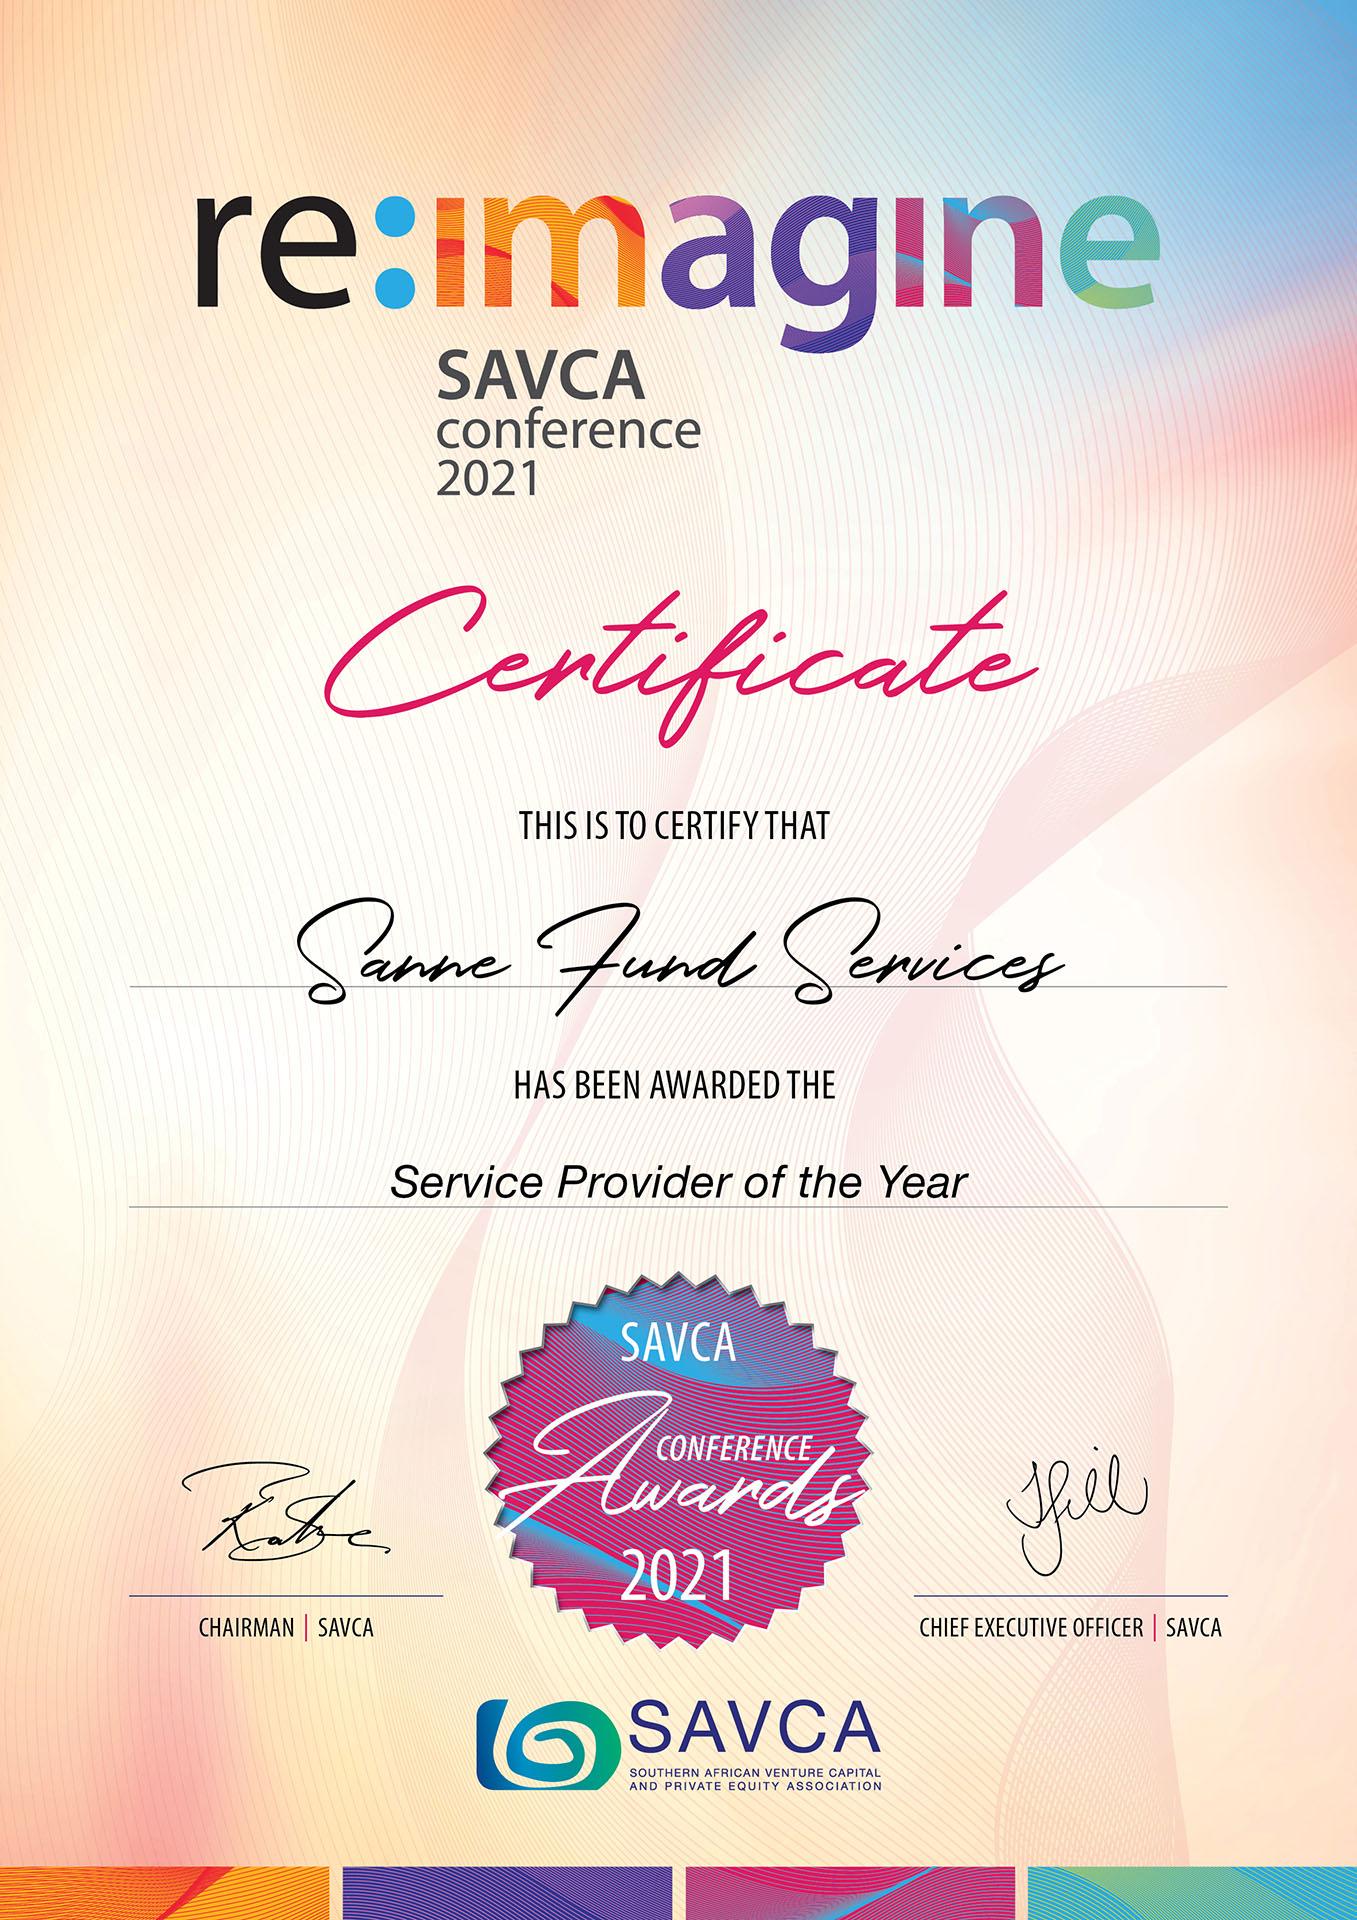 SAVCA-Conference-Award-2021-Sanne-Fund-Services